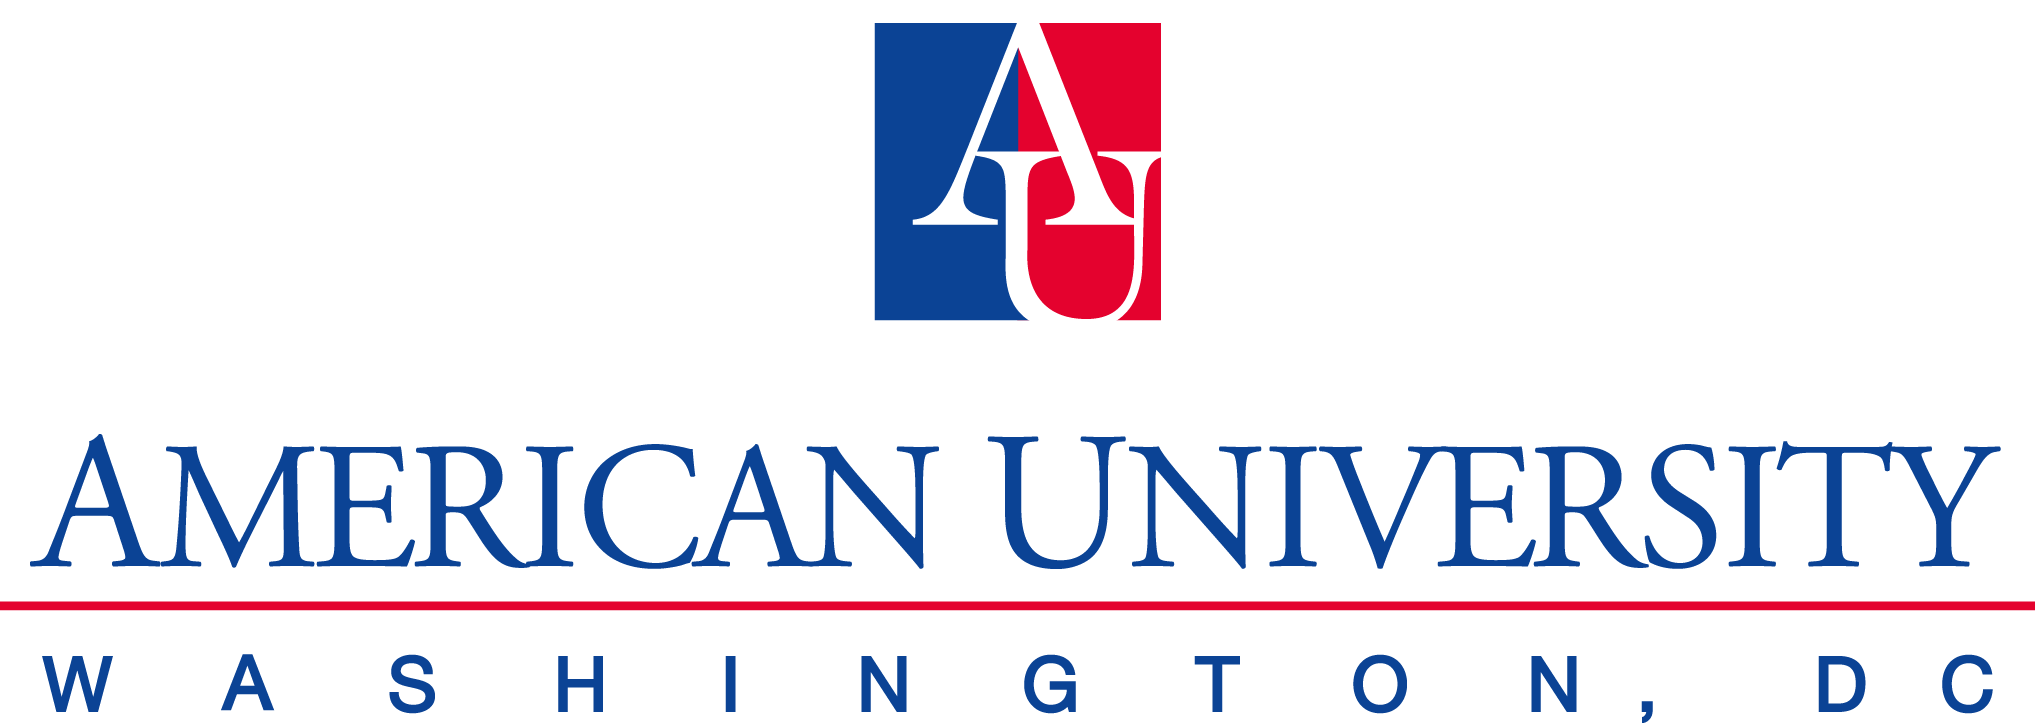 au-logo-american-university-washington-dc